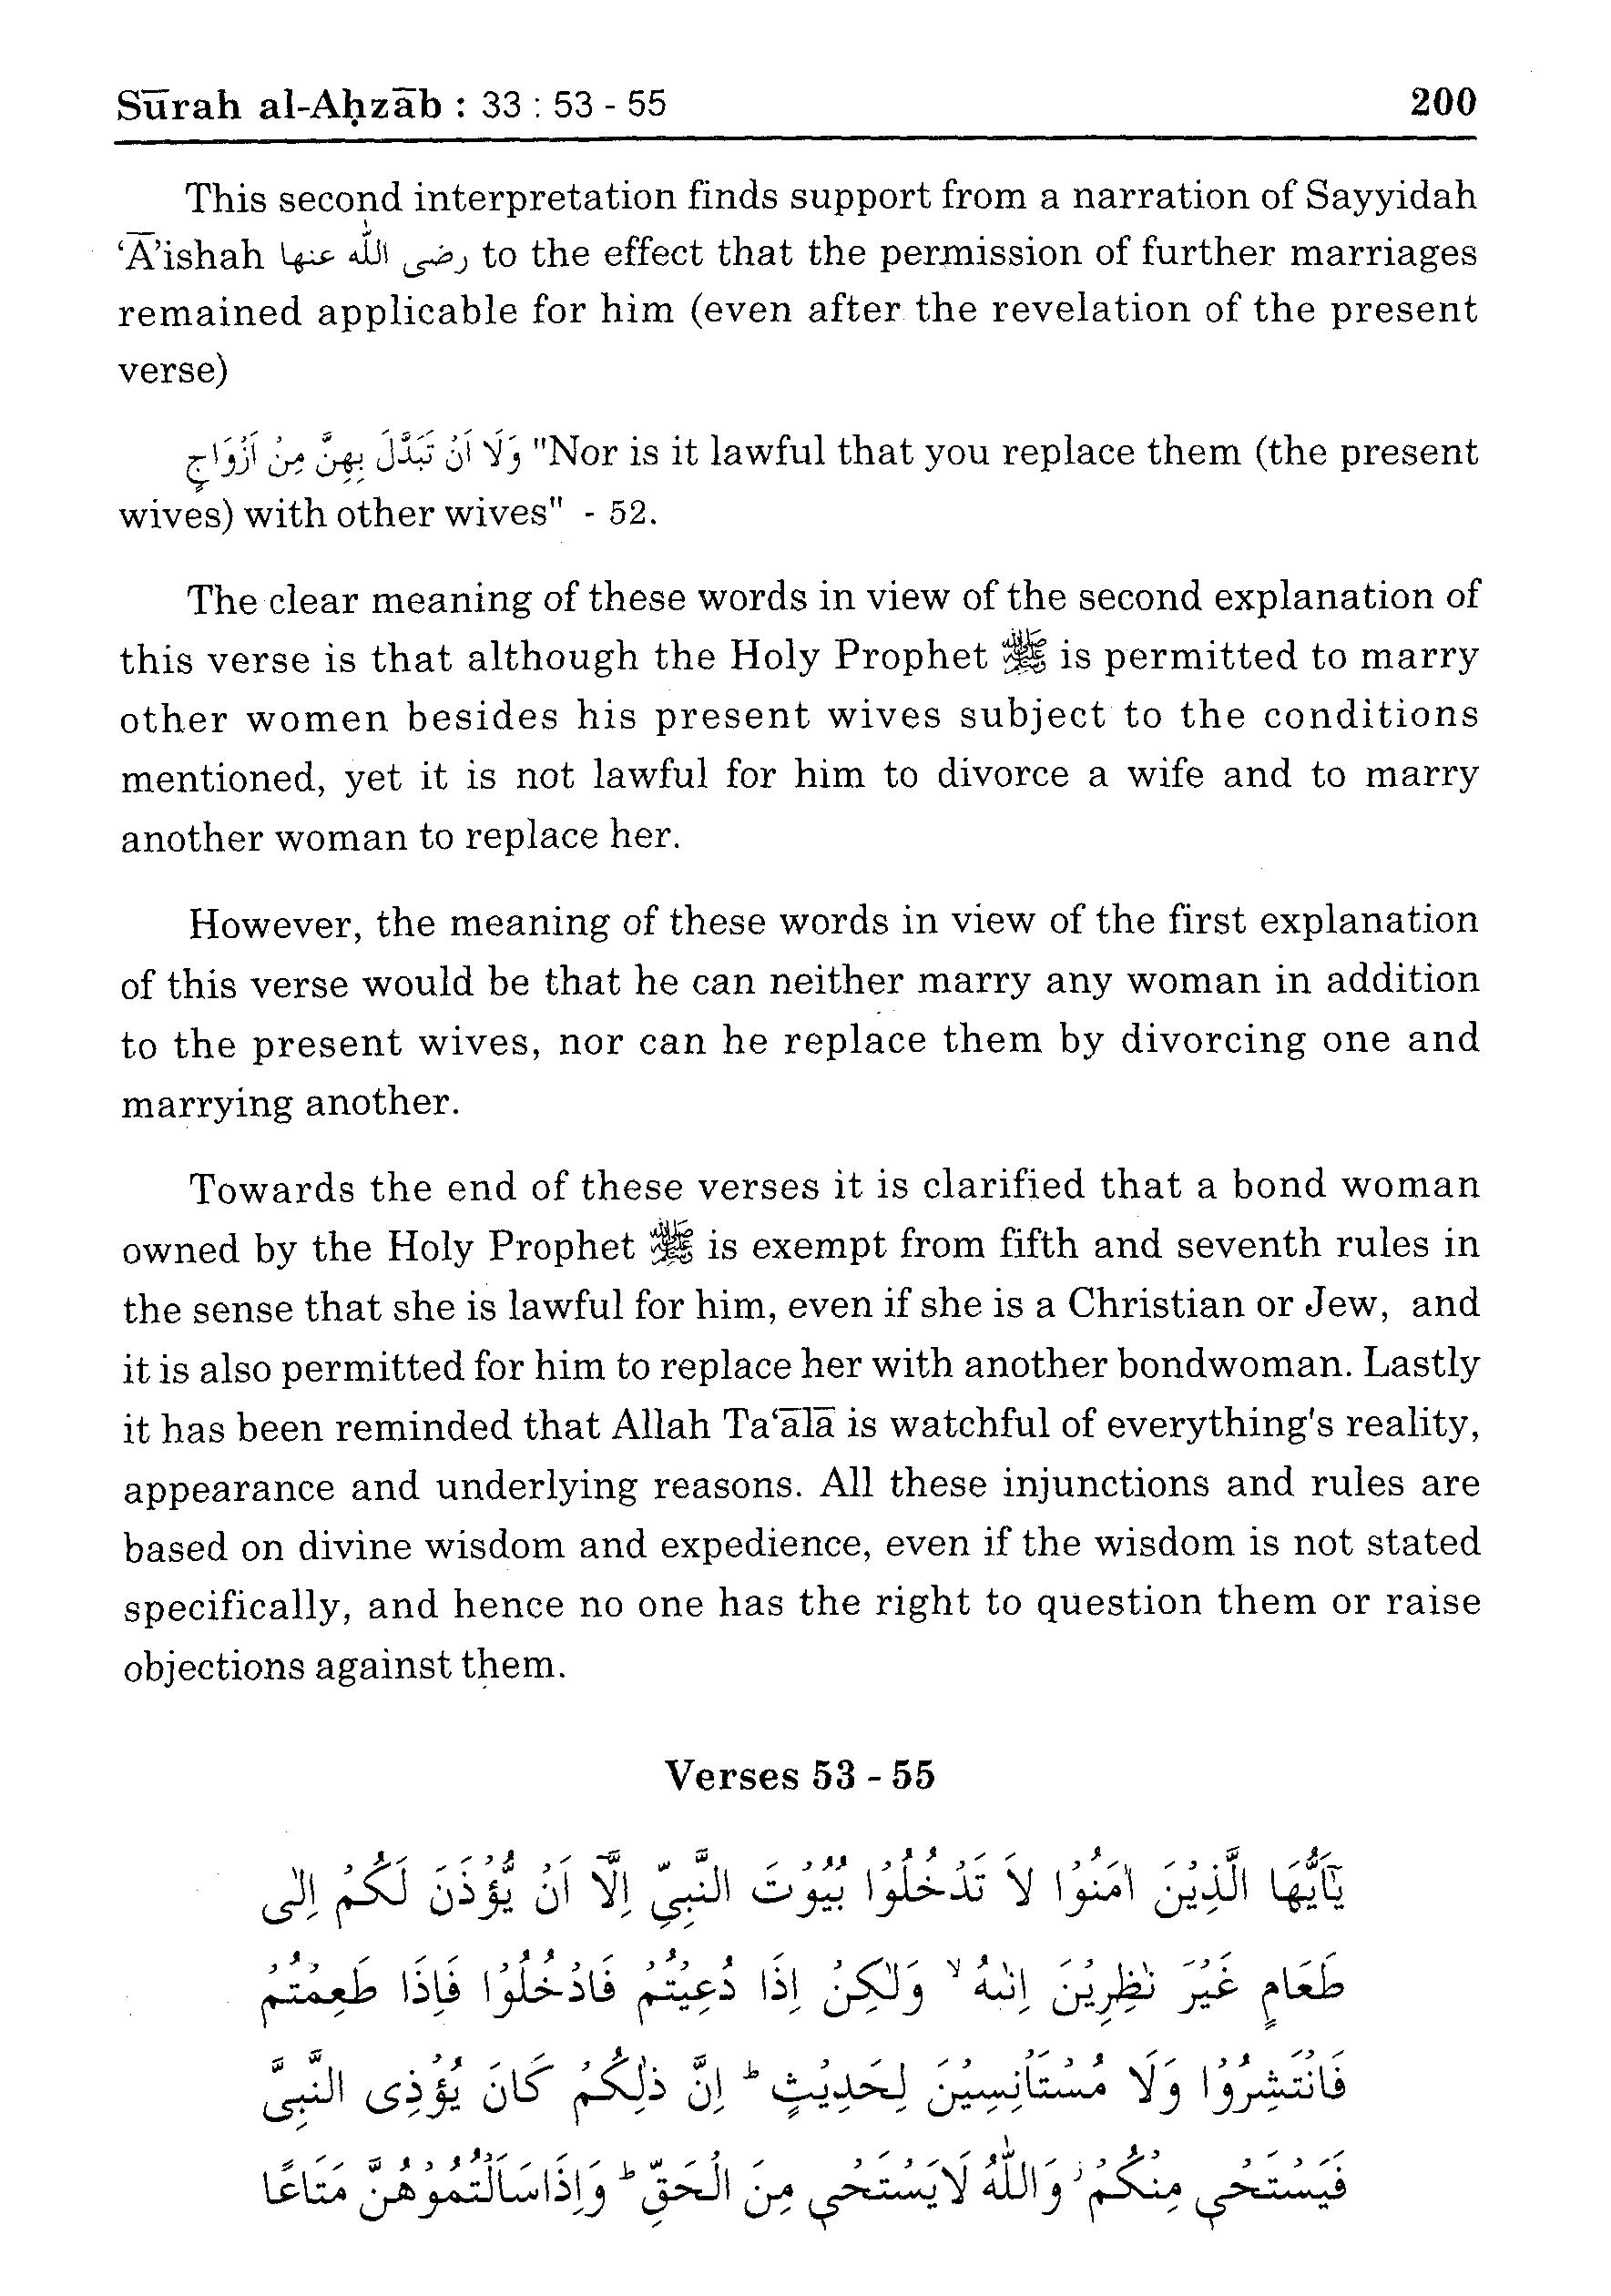 Surah Al-Ahzab 33:53-55 - Maariful Quran - Maarif ul Quran